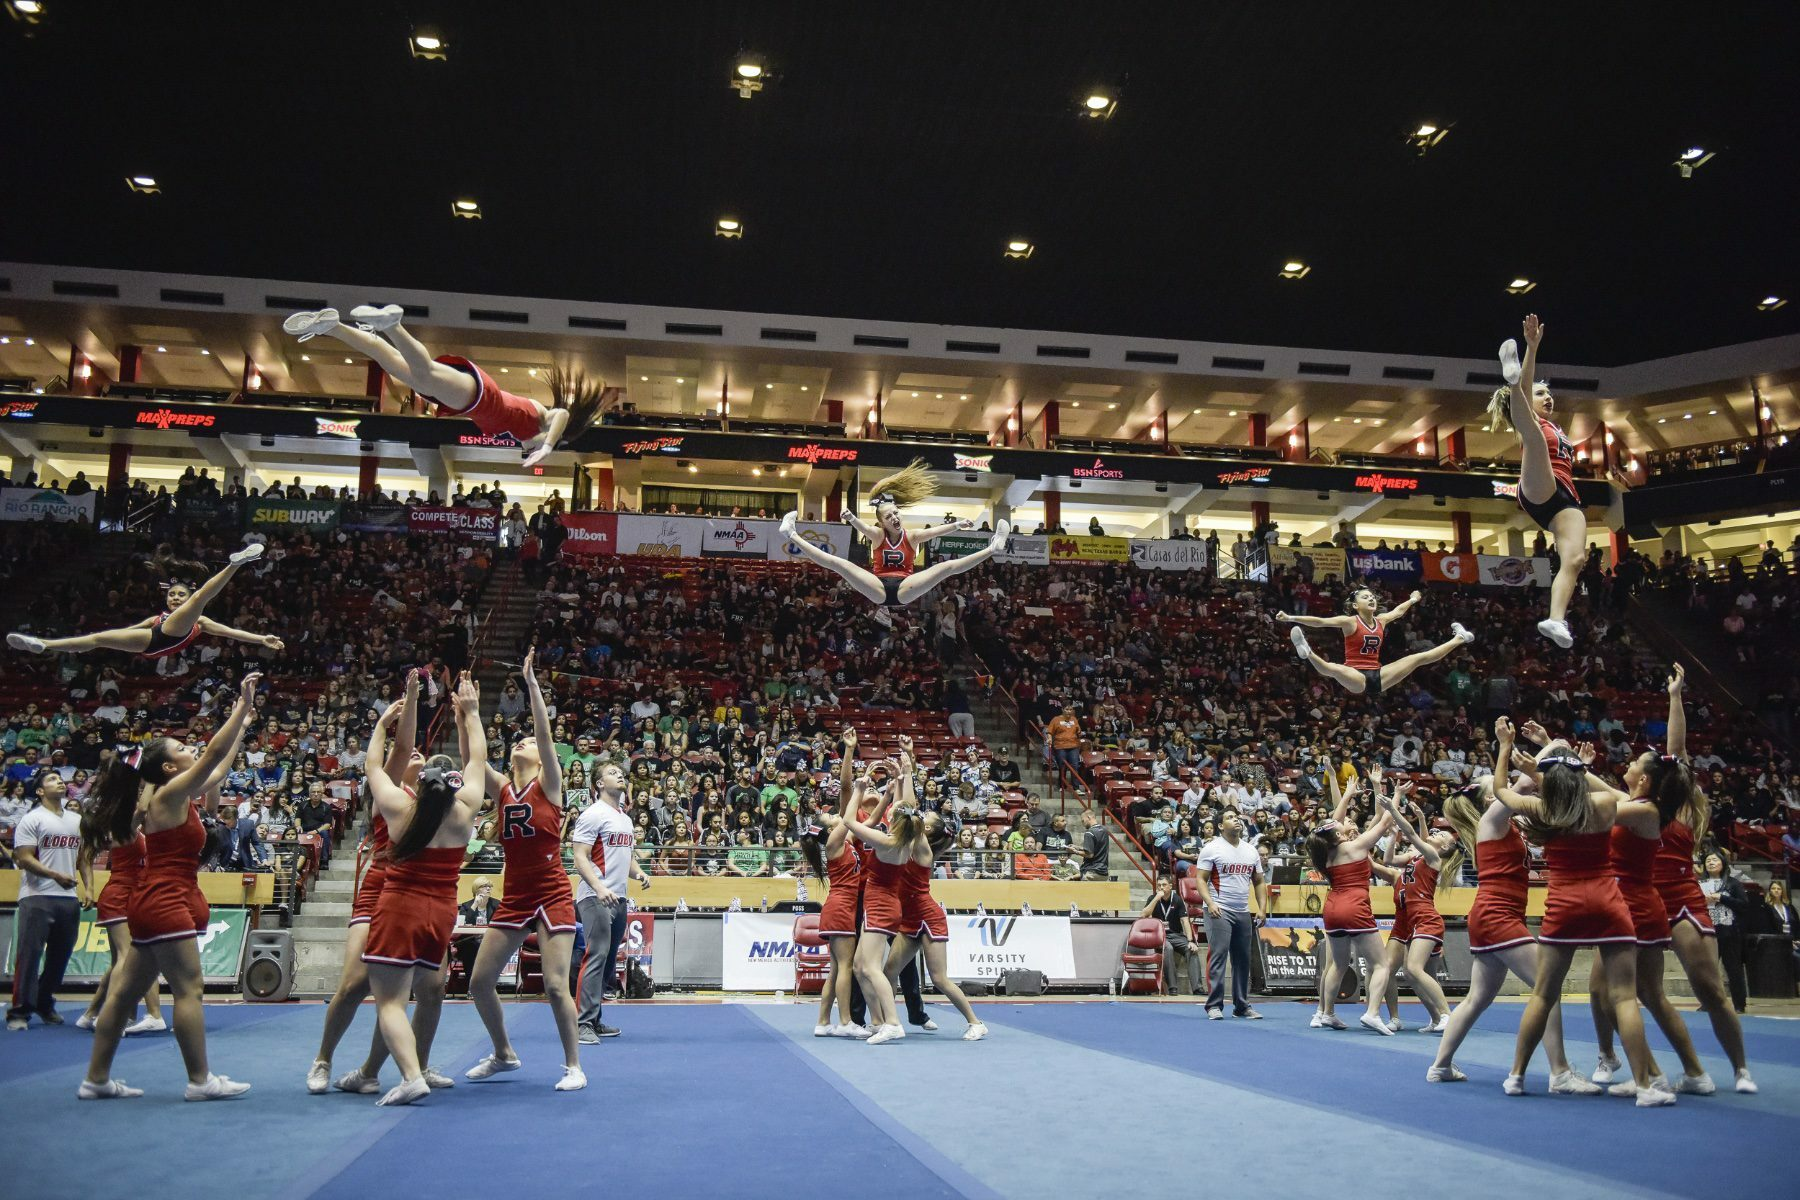 Cheerleaders doing stunts on a competition floor.